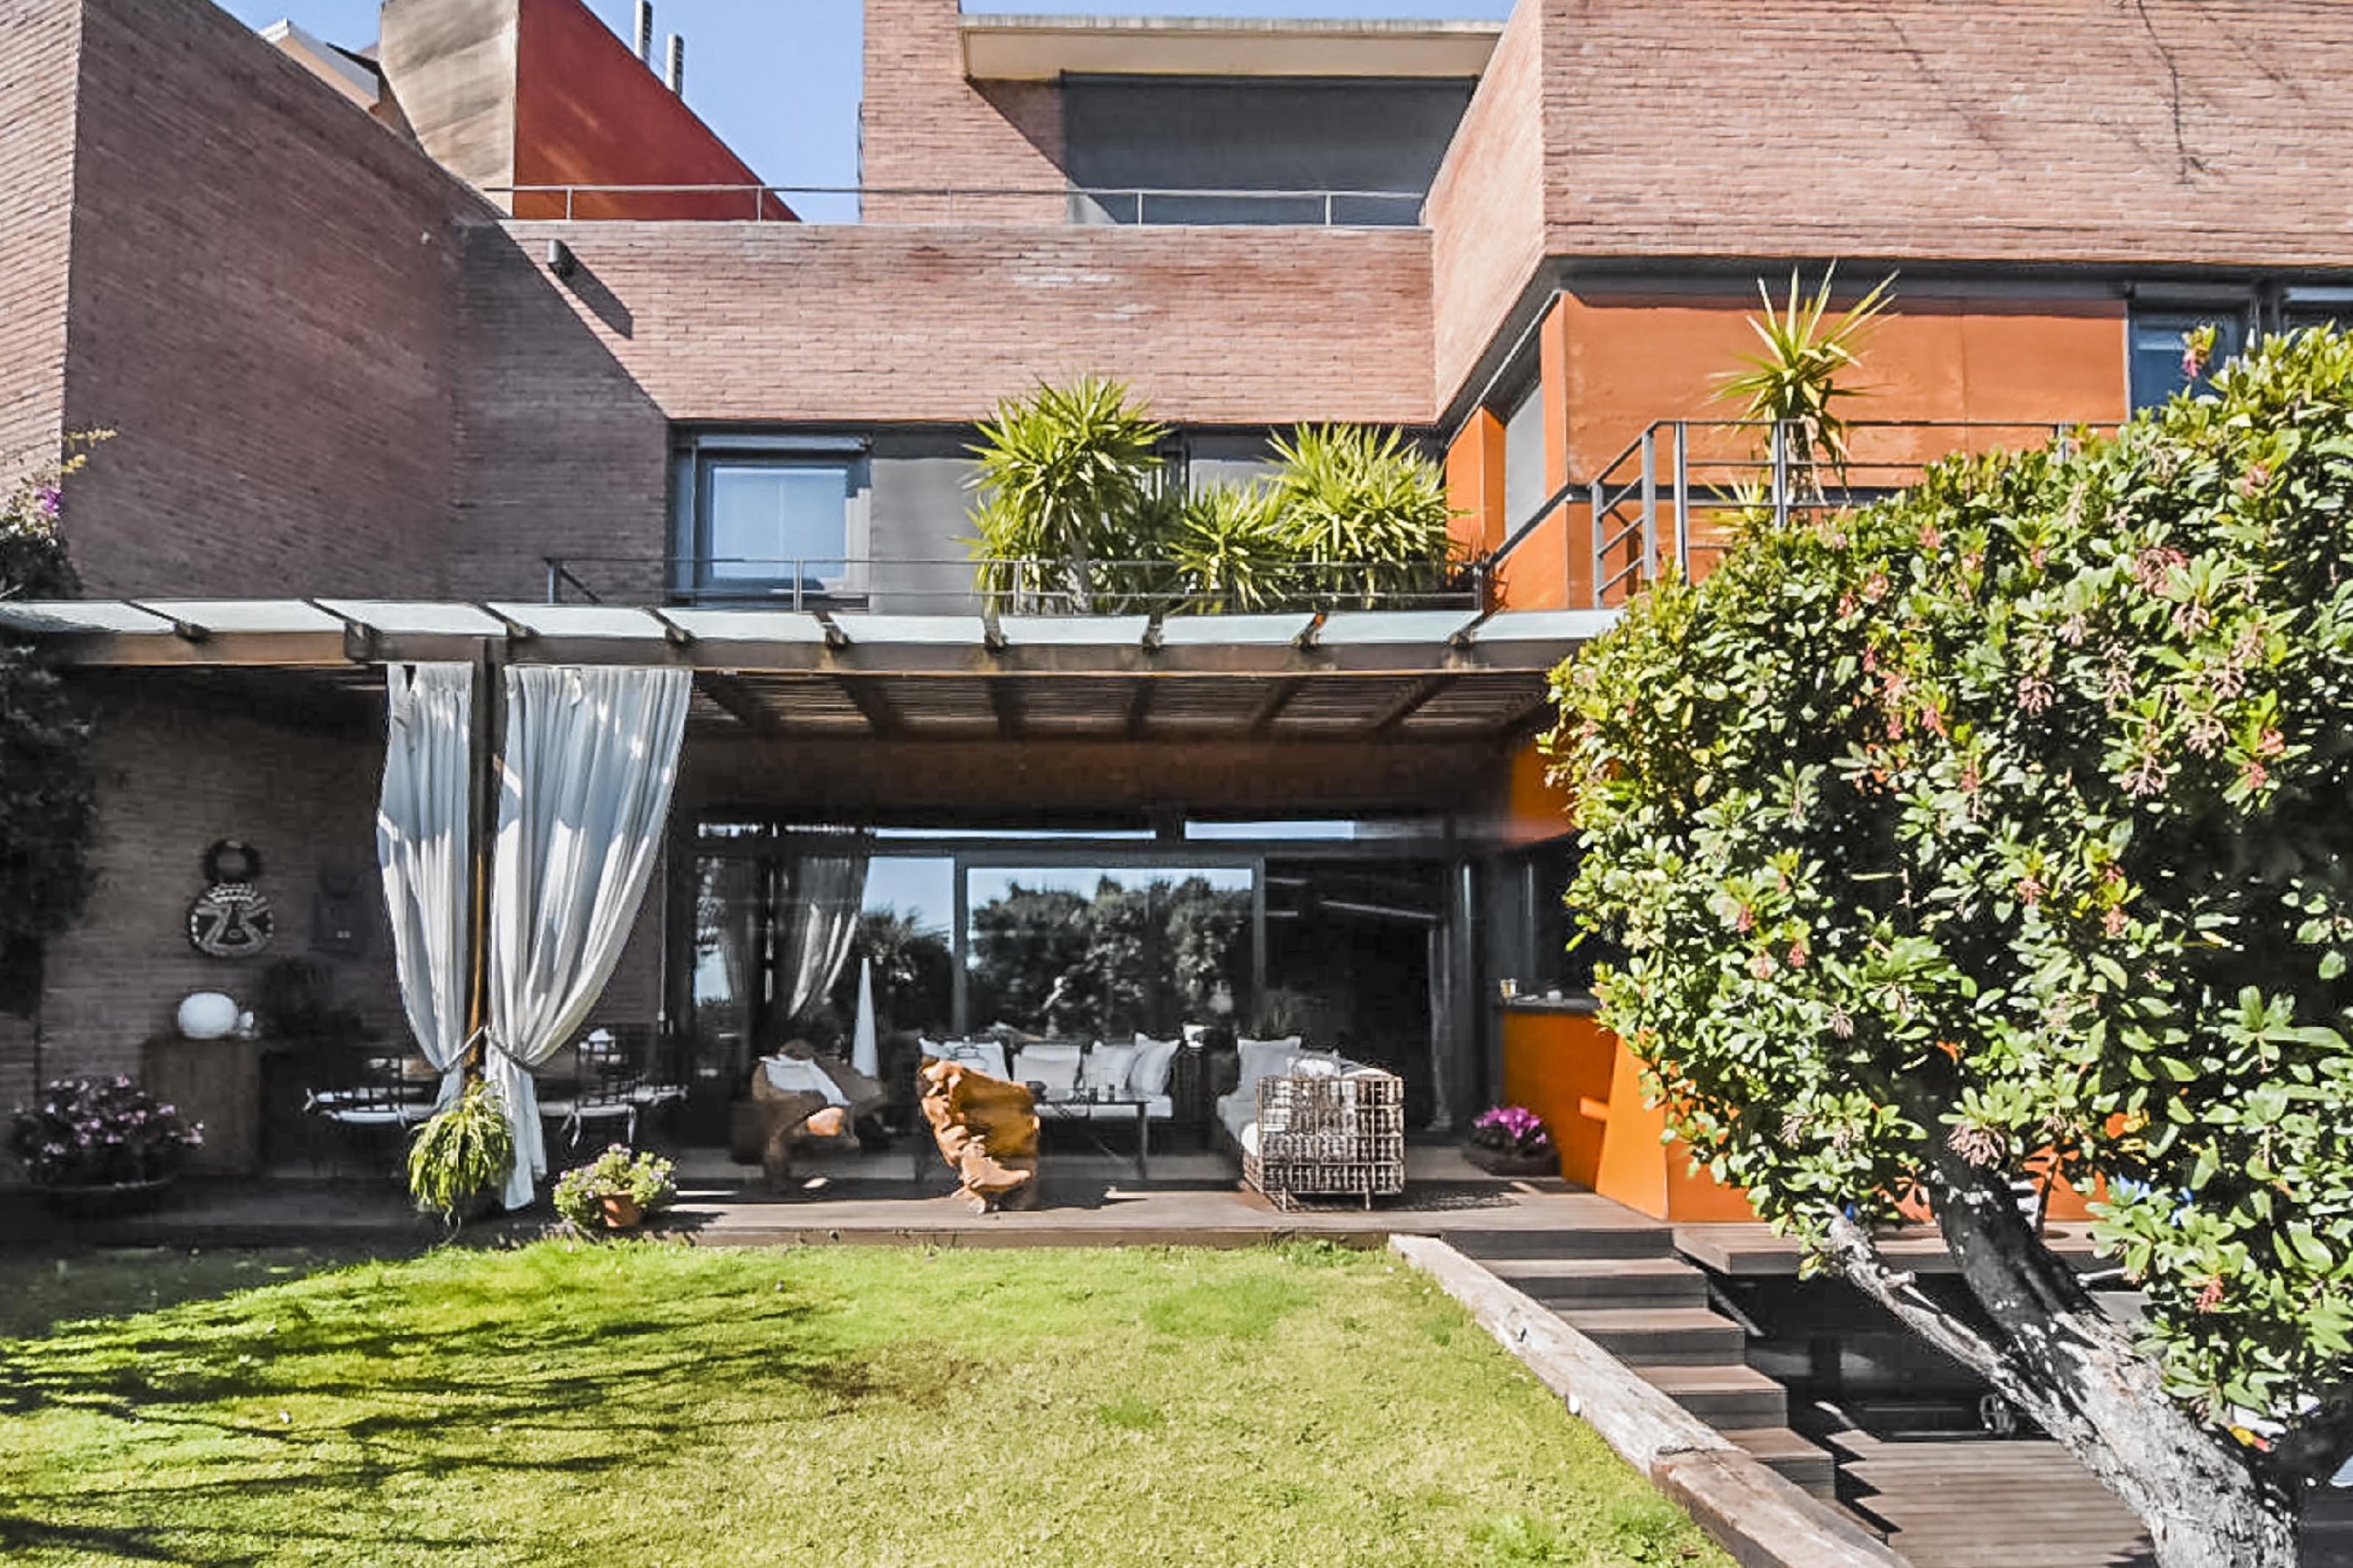 214424 Casa en venta en Les Corts, Pedralbes 1